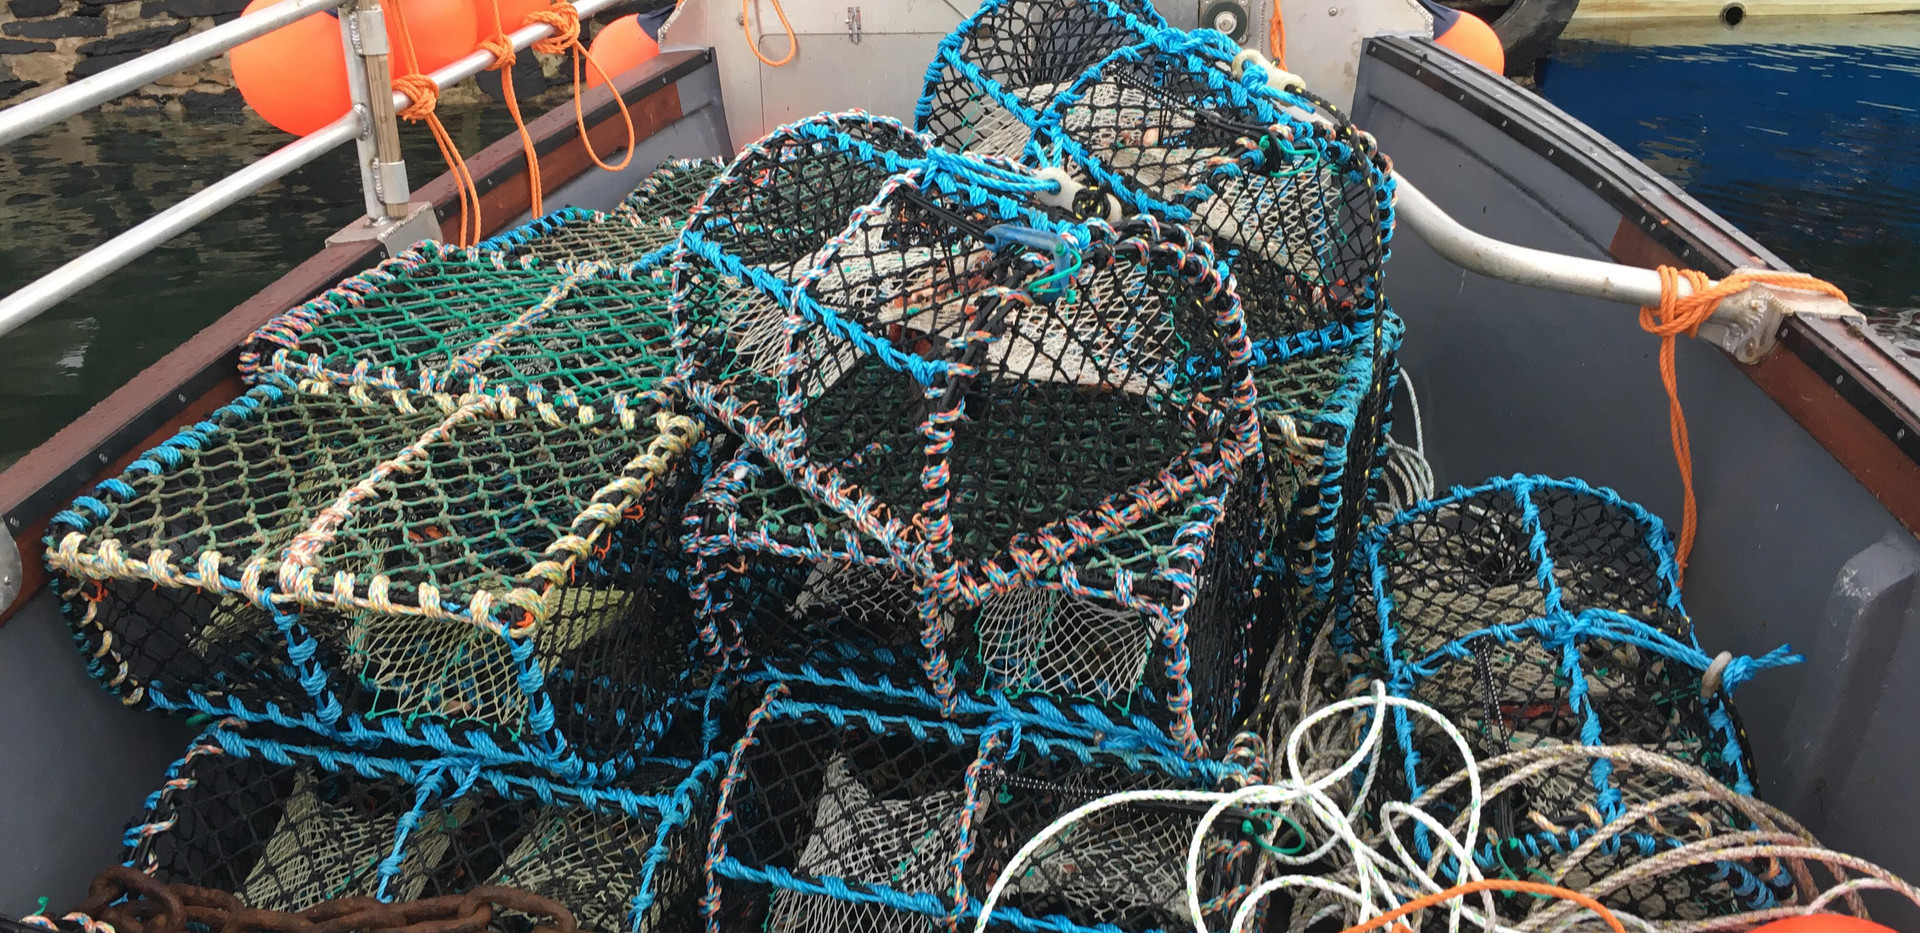 The Fisherman's creels